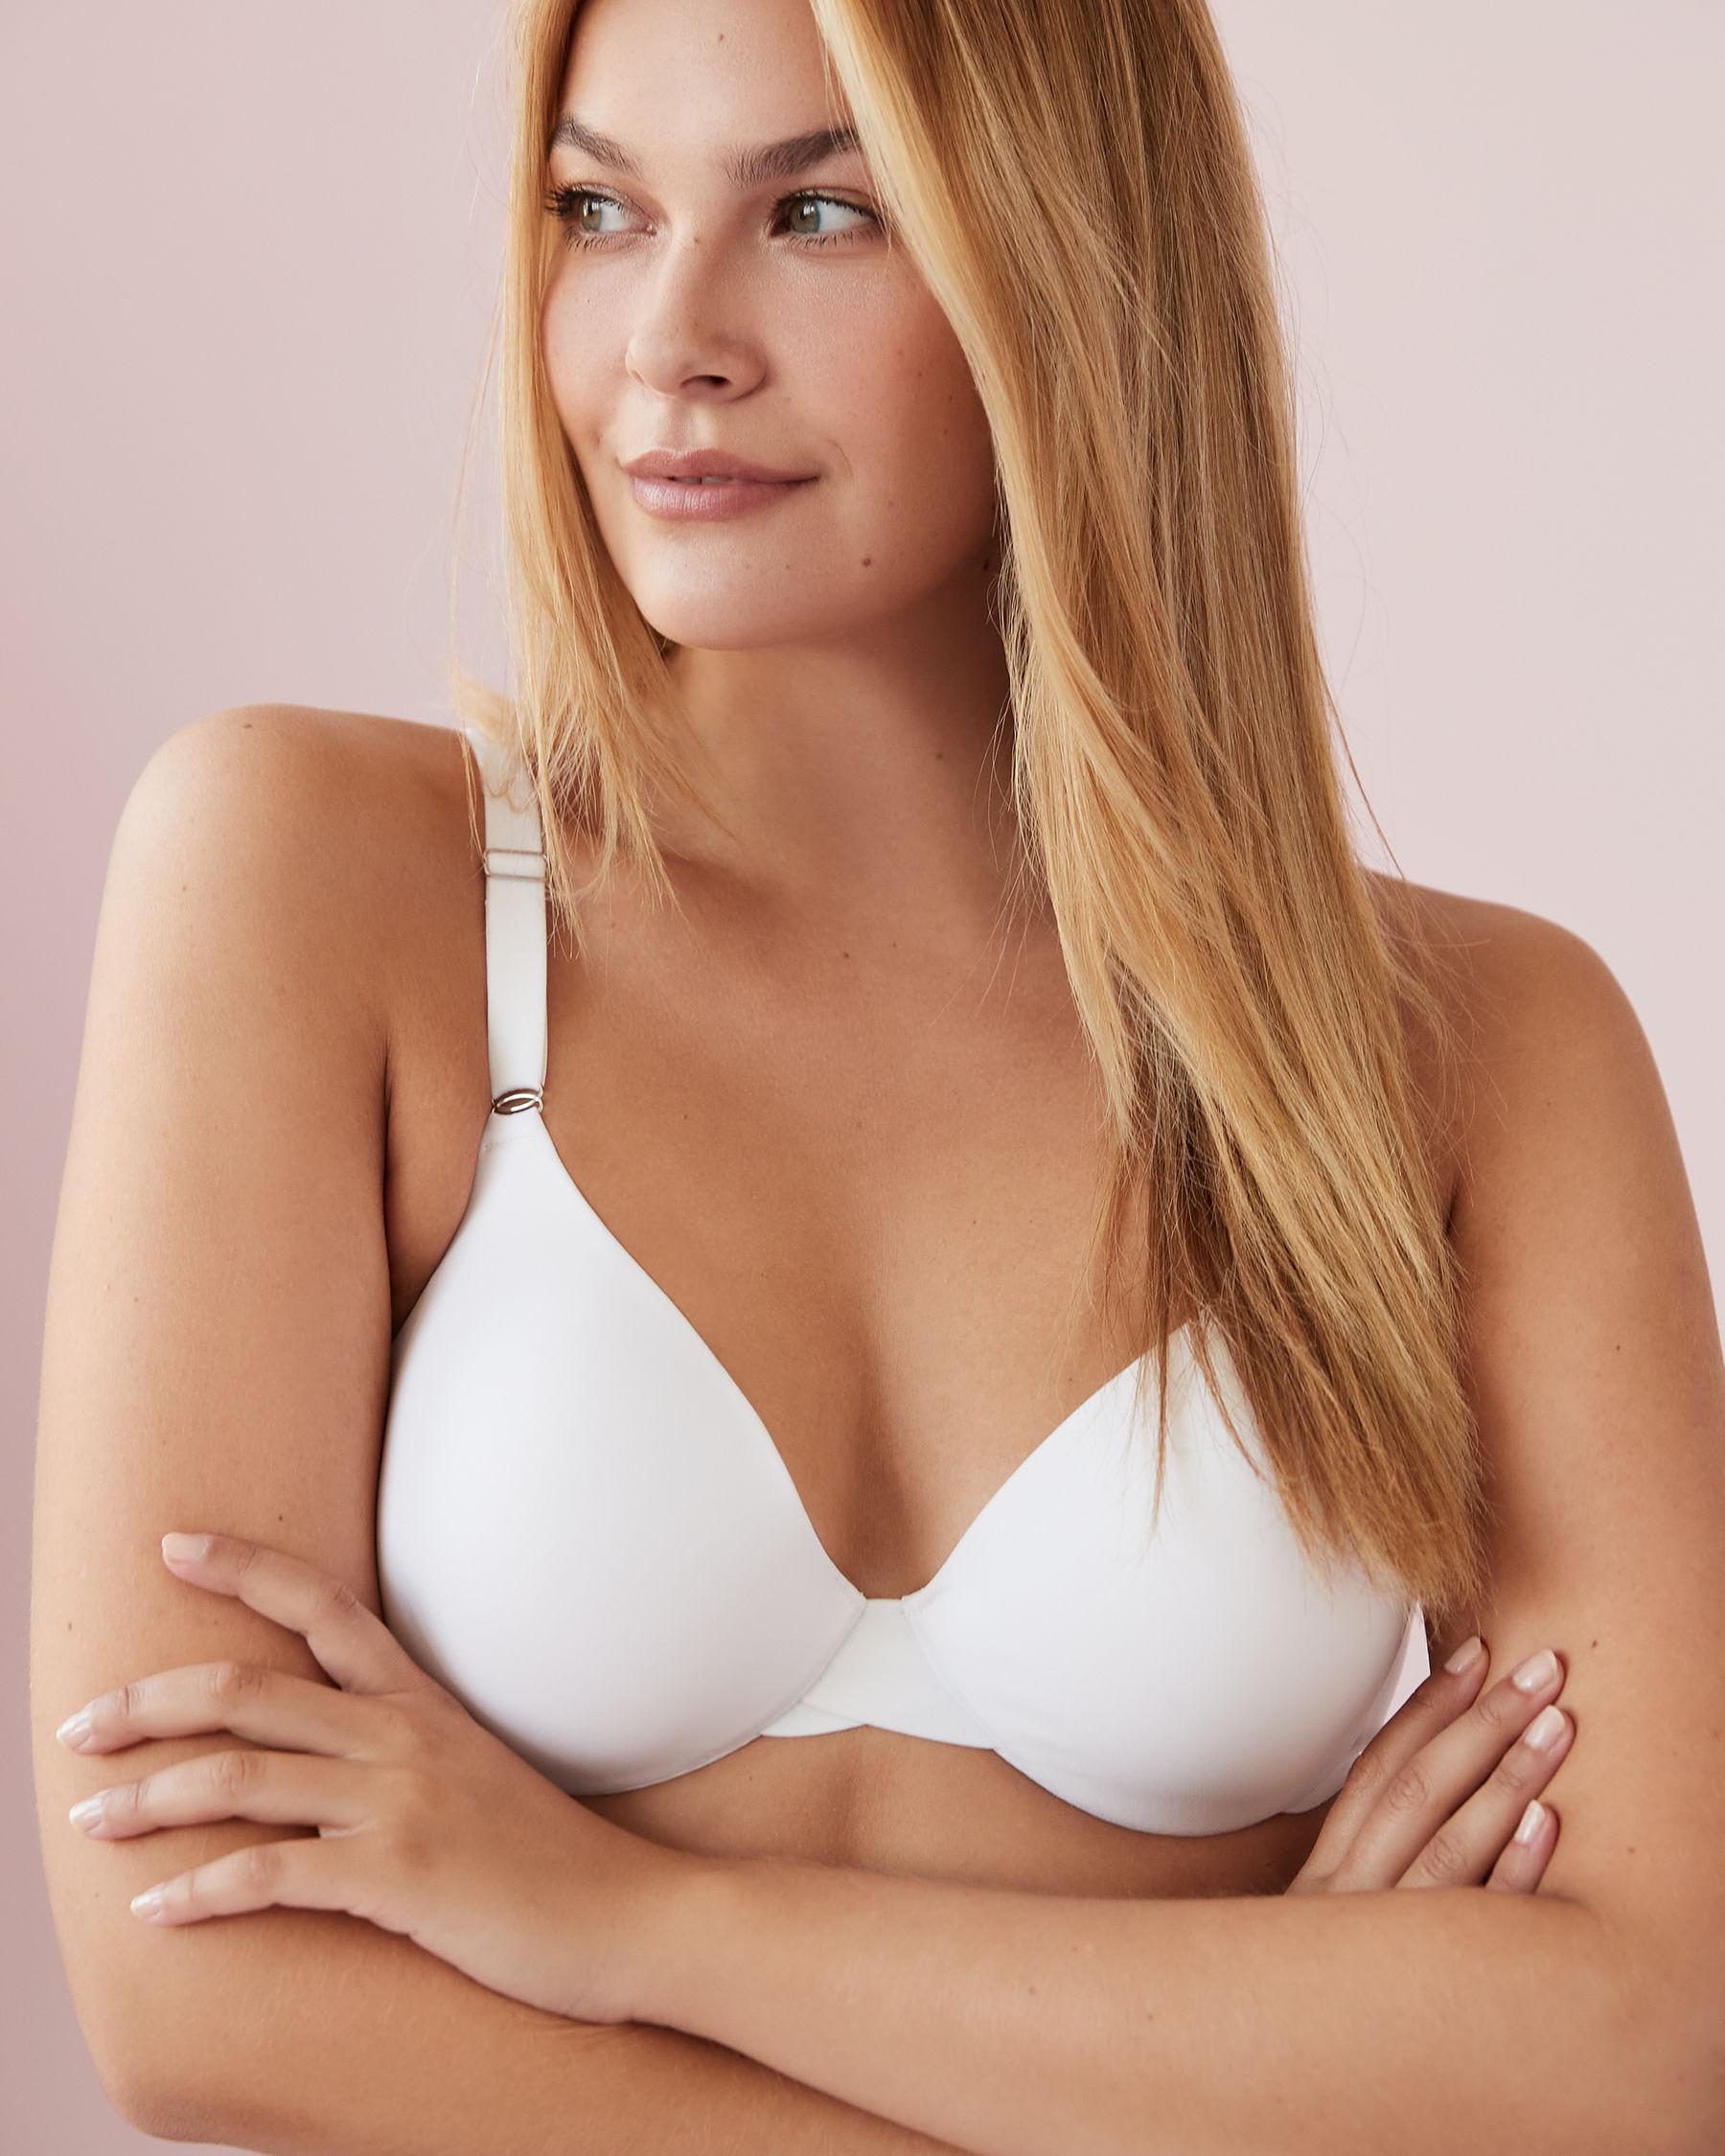 LA VIE EN ROSE Lightly Lined Sleek Back Bra White 169-113-1-00 - View1